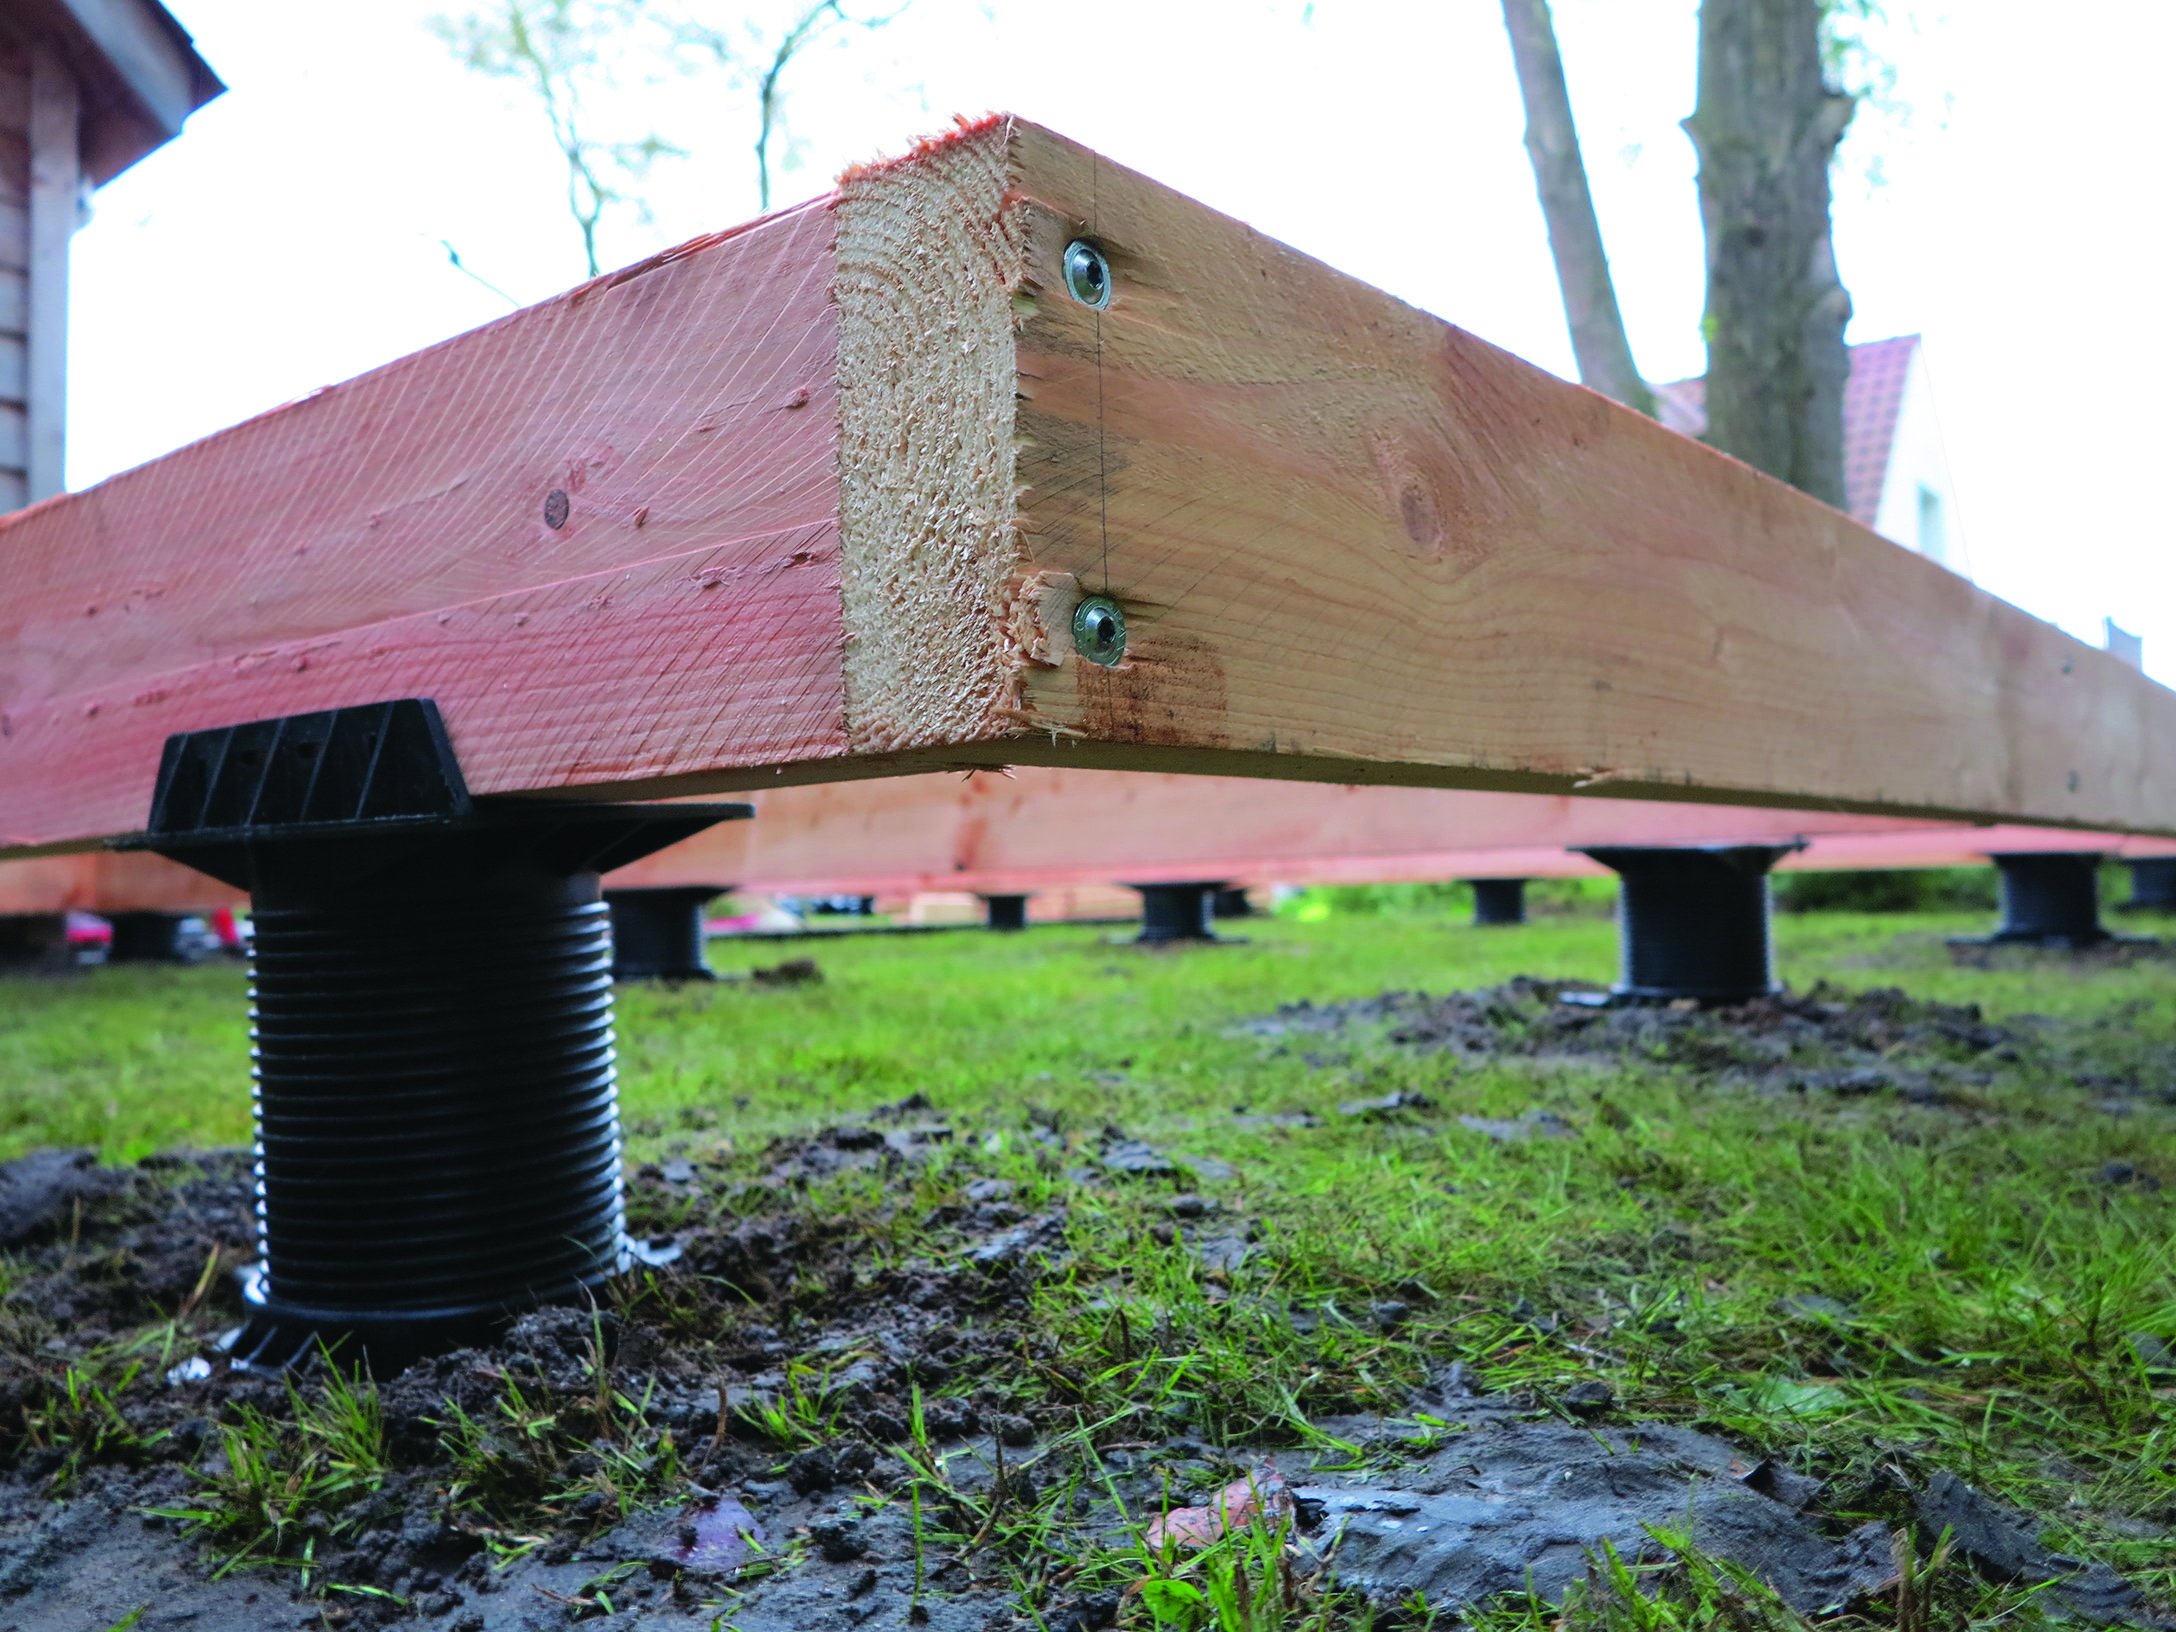 Construction De Terrasse, Abri De Jardin Avec Des Fondations ... pour Fondation Abri De Jardin